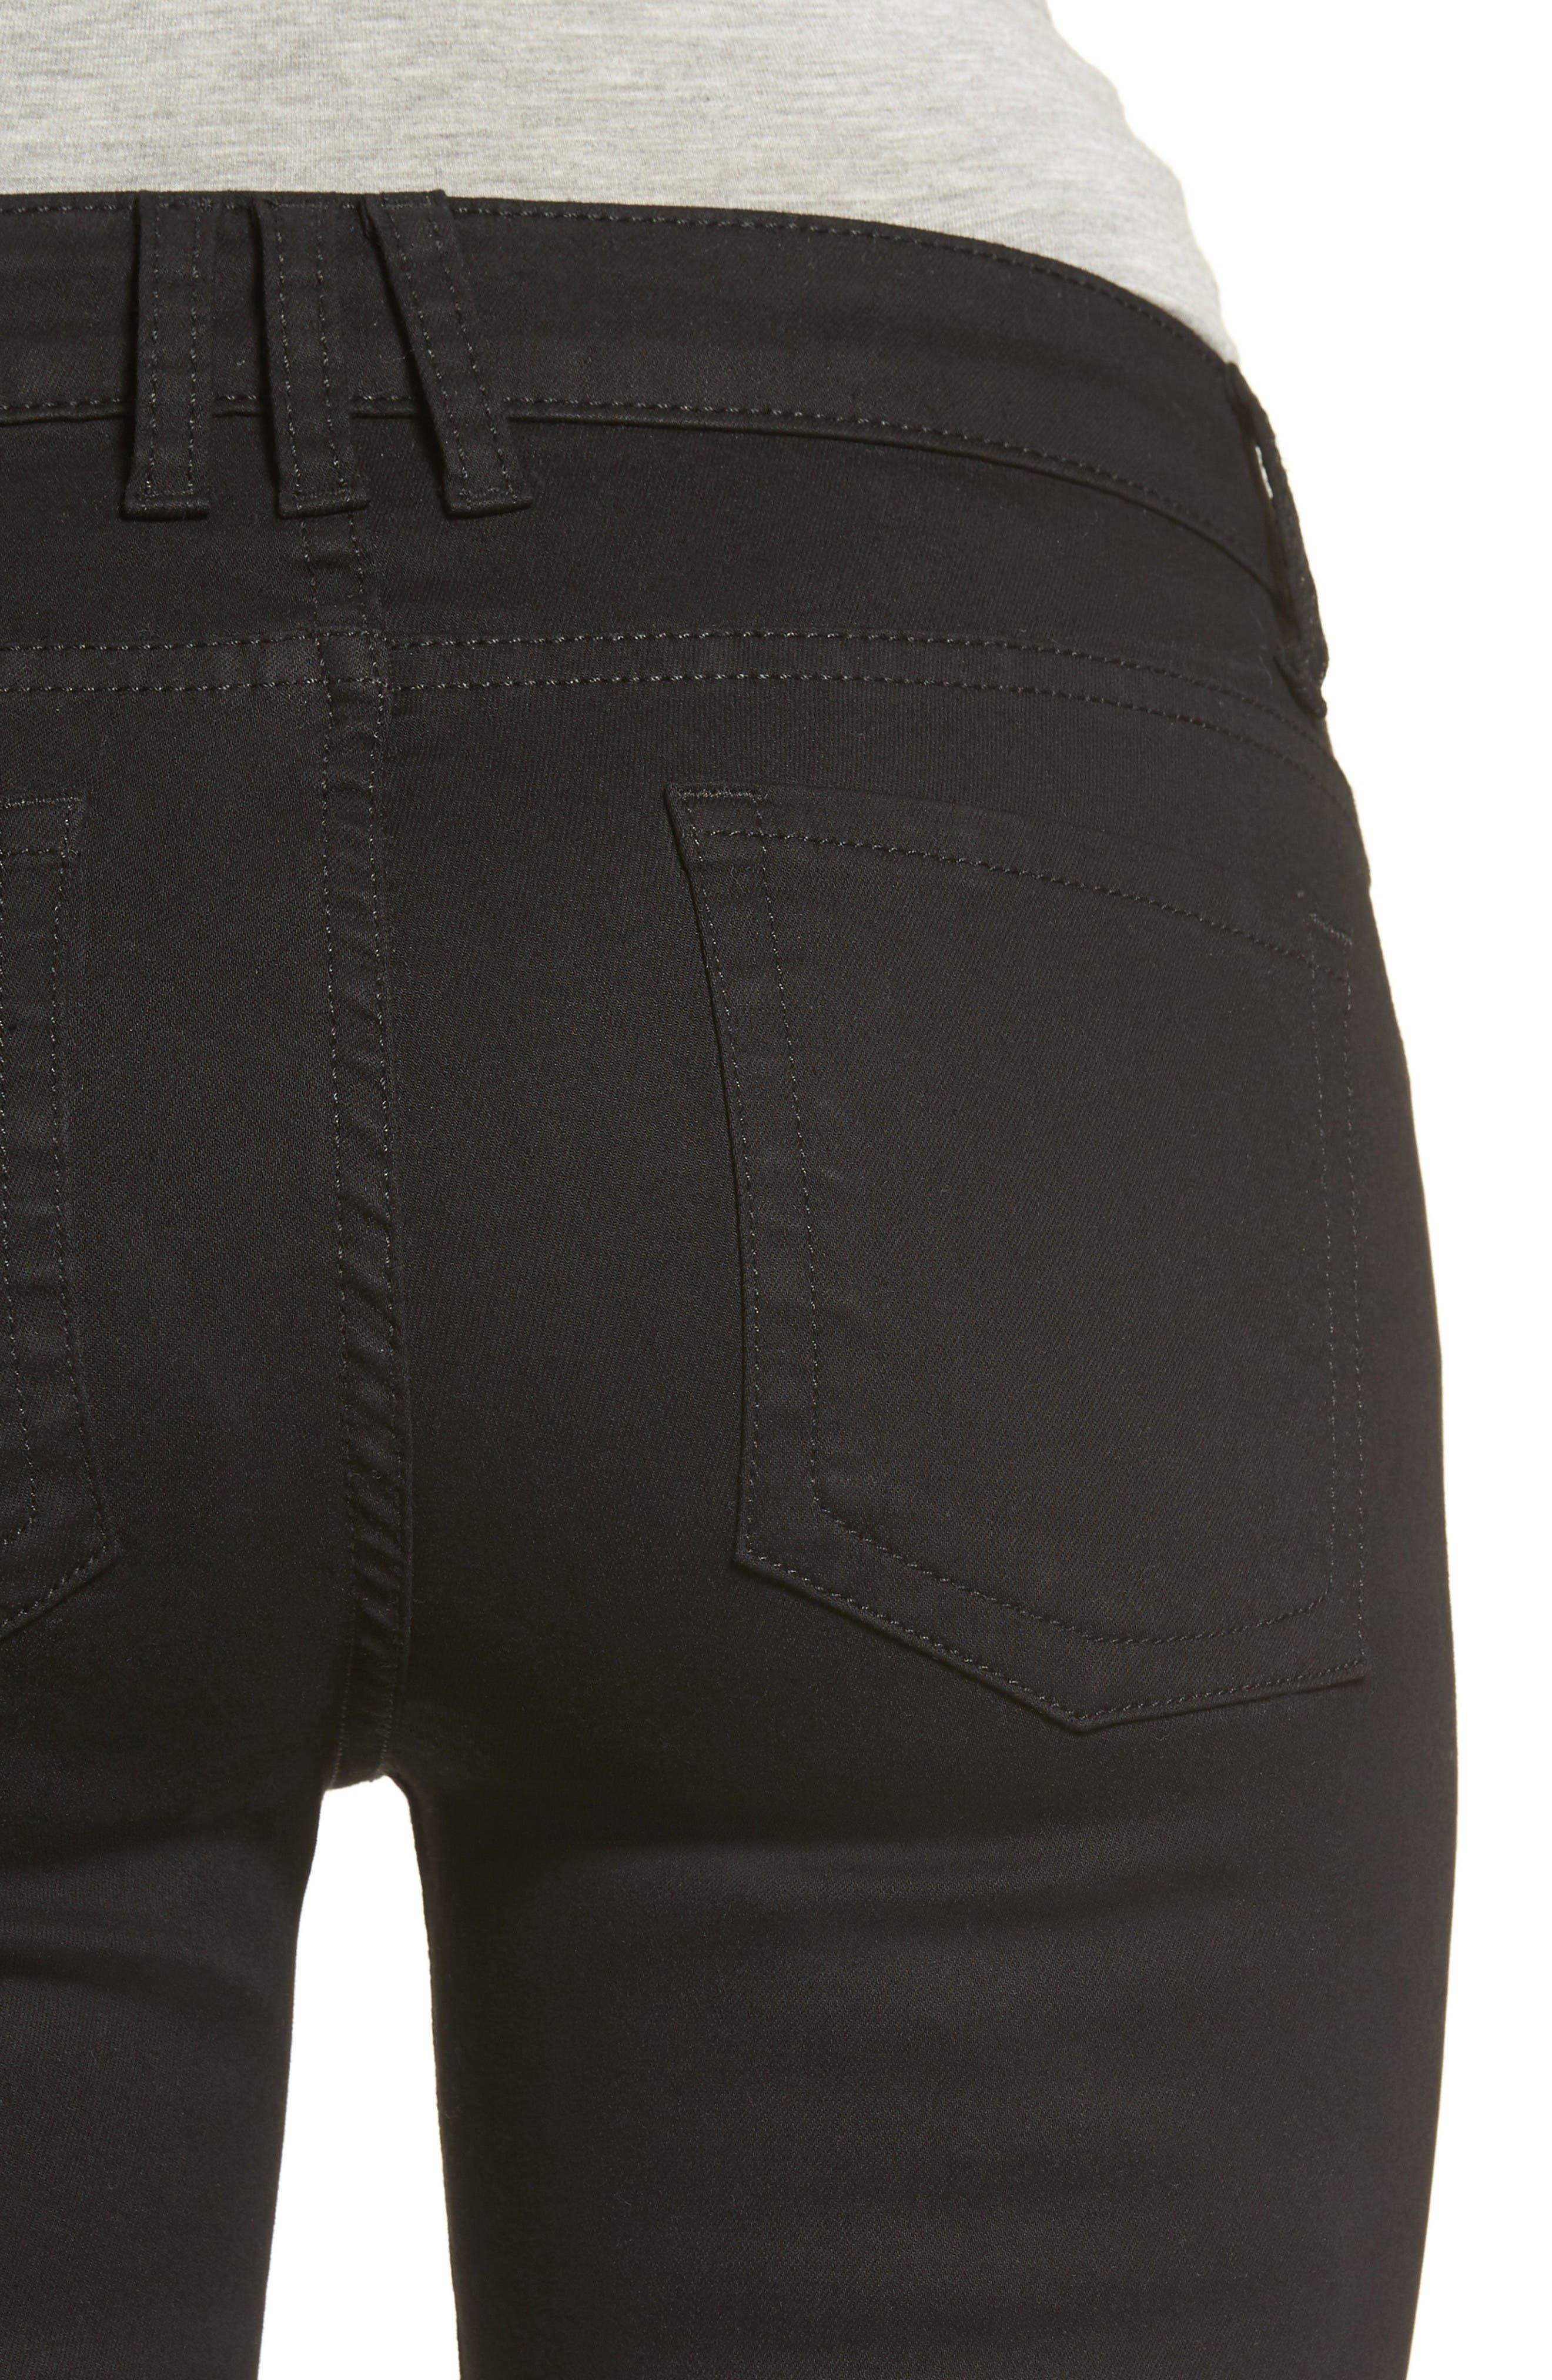 Alternate Image 4  - KUT from the Kloth Natalie Stretch Bootleg Jeans (Regular & Petite)